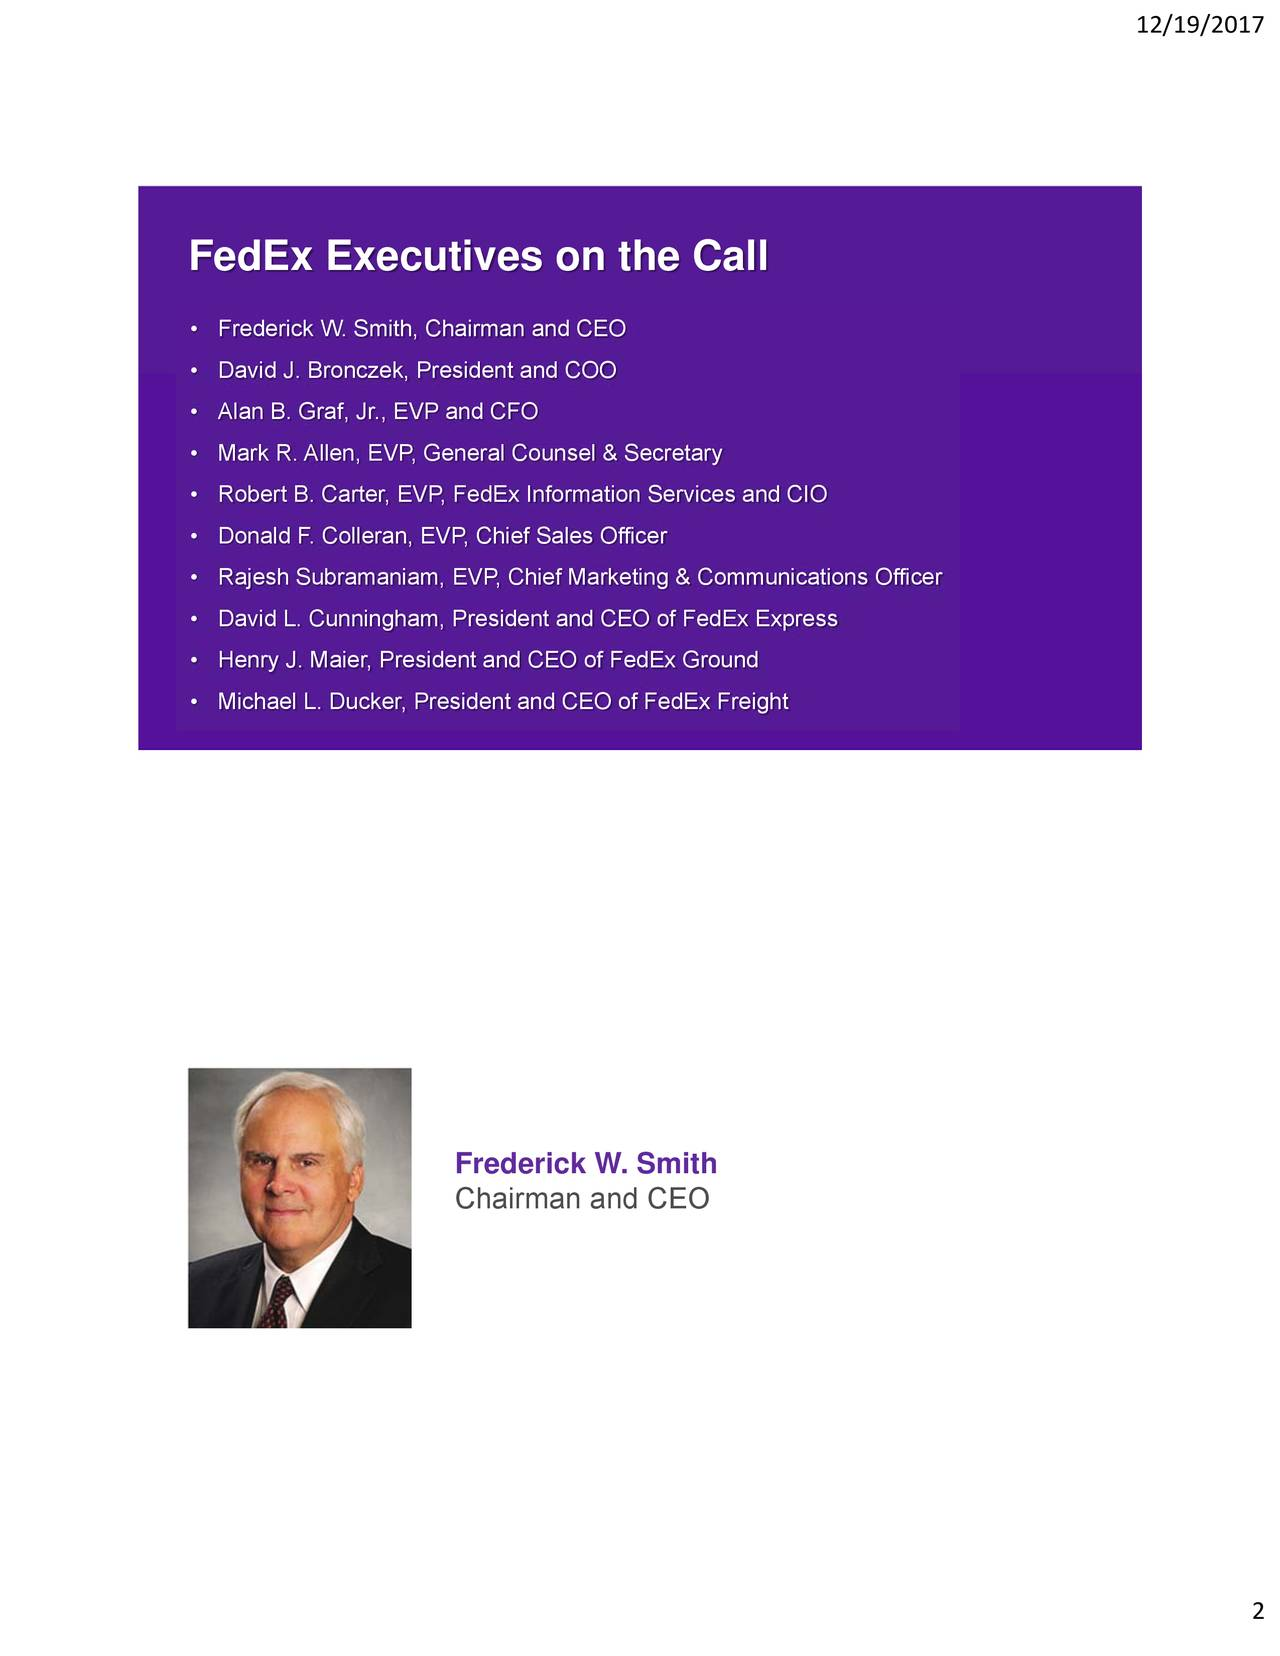 FedEx Executives on the Call • Frederick W. Smith, Chairman and CEO • David J. Bronczek, President and COO • Alan B. Graf, Jr., EVP and CFO • Mark R. Allen, EVP, General Counsel & Secretary • Robert B. Carter, EVP, FedEx Information Services and CIO • Donald F. Colleran, EVP, Chief Sales Officer • Rajesh Subramaniam, EVP, Chief Marketing & Communications Officer • David L. Cunningham, President and CEO of FedEx Express • Henry J. Maier, President and CEO of FedEx Ground • Michael L. Ducker, President and CEO of FedEx Freight Frederick W. Smith Chairman and CEO 2